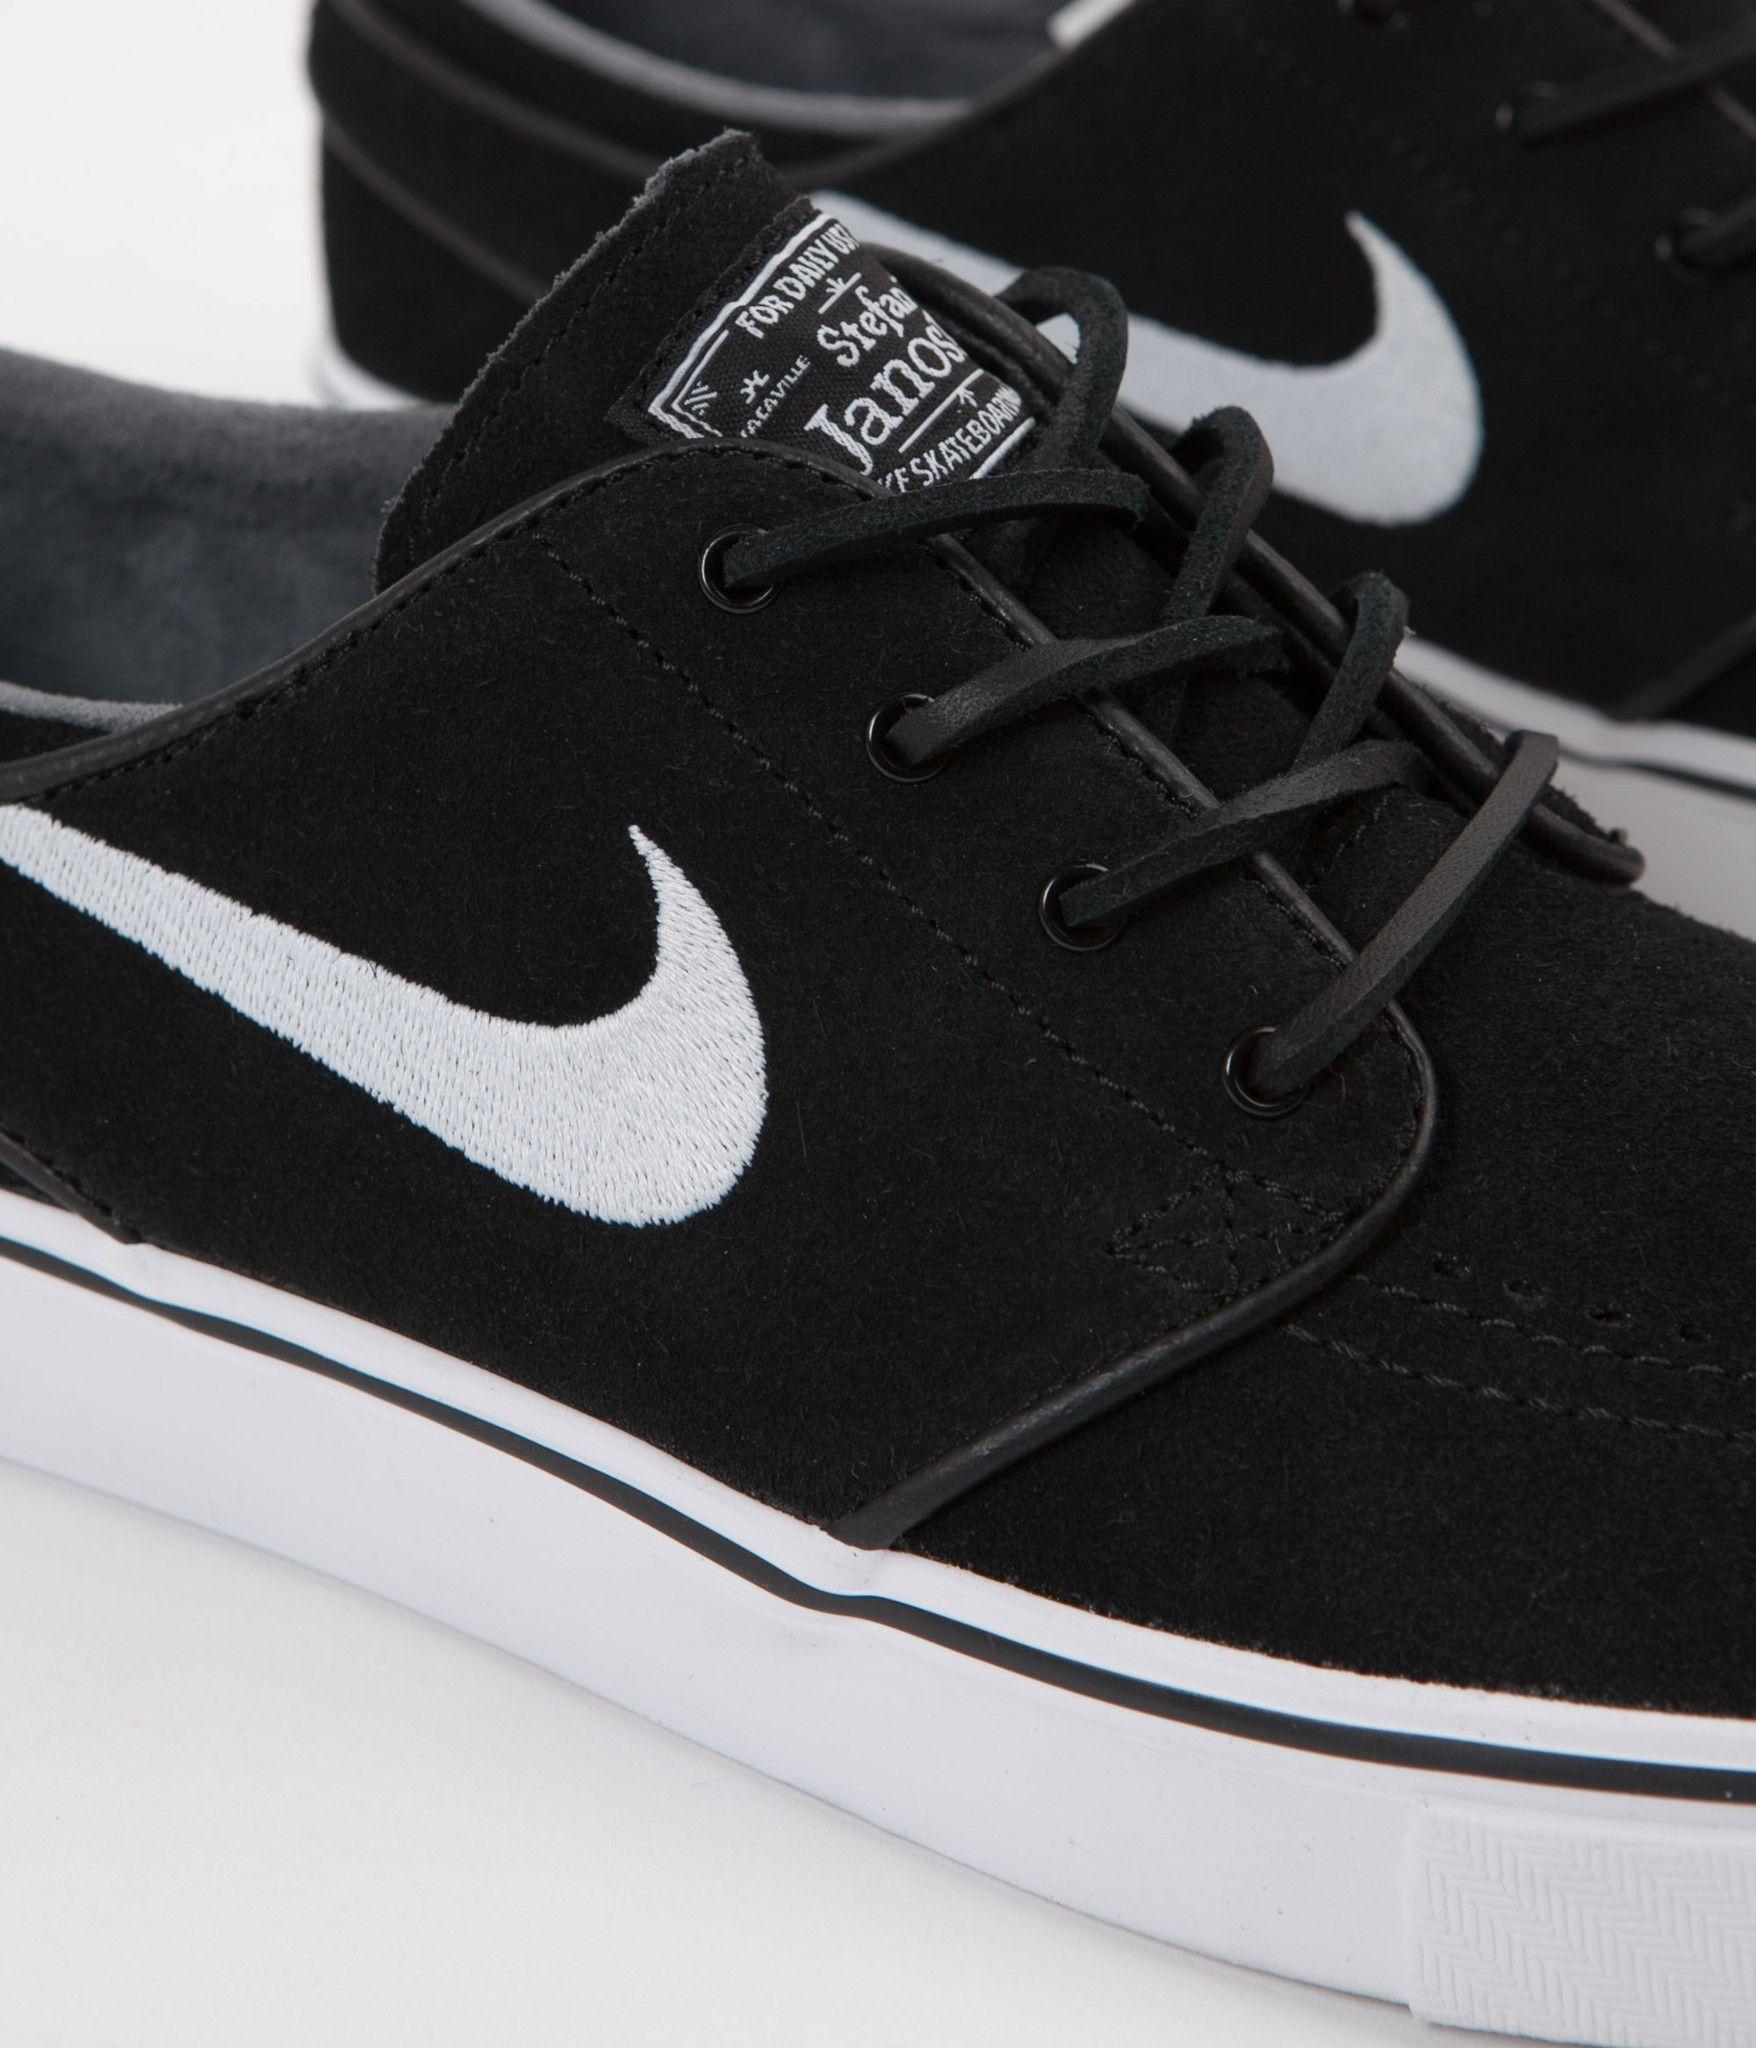 Nike Sb Stefan Janoski Og Shoes Black White Gum Light Brown Cute Nike Shoes Custom Nike Shoes Black Shoes